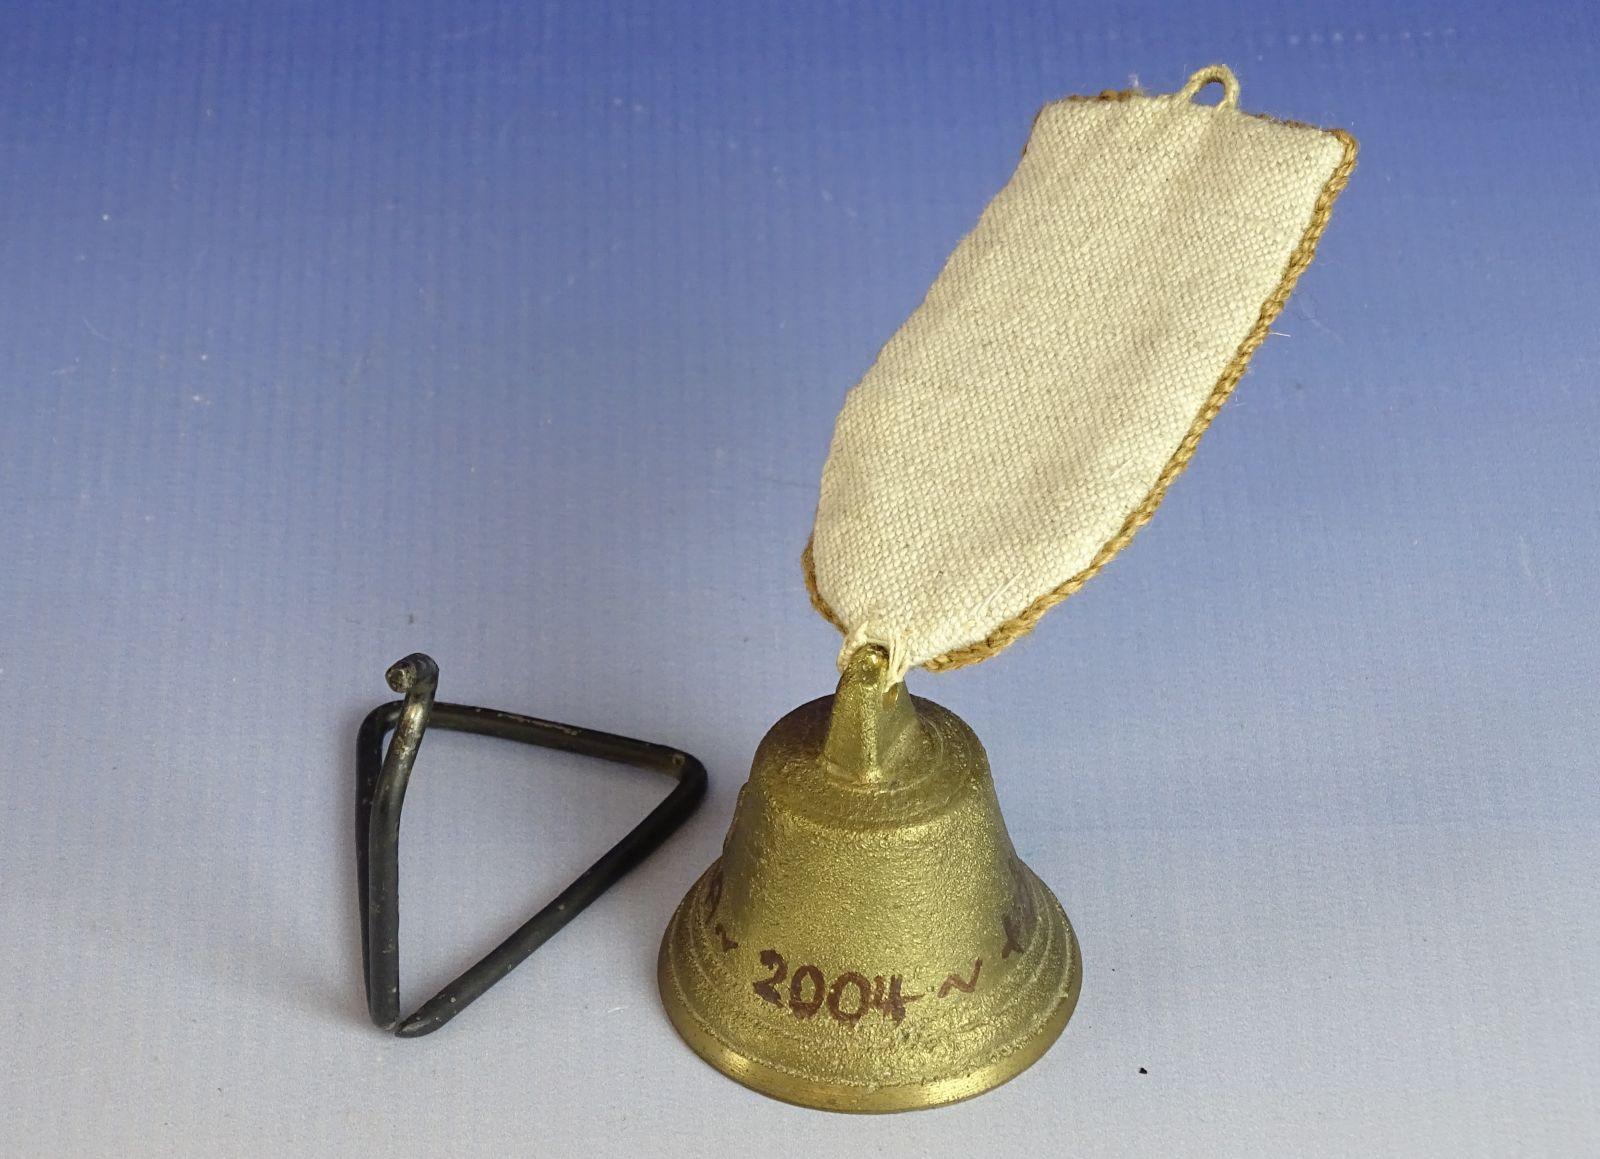 DSC06577.JPG (1600×1159)